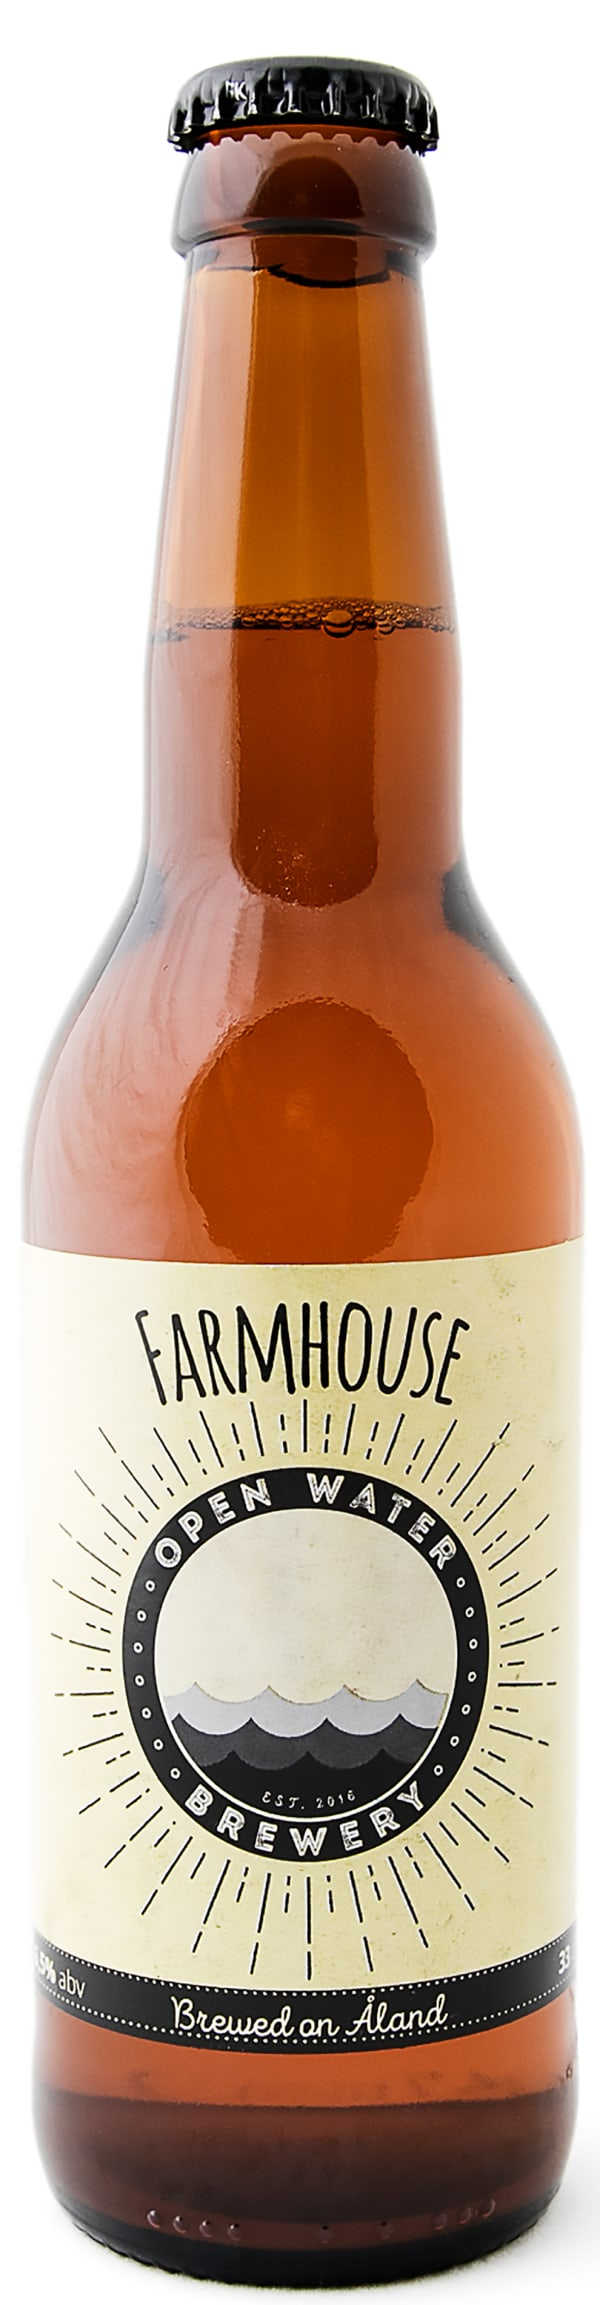 Open Water Farmhouse